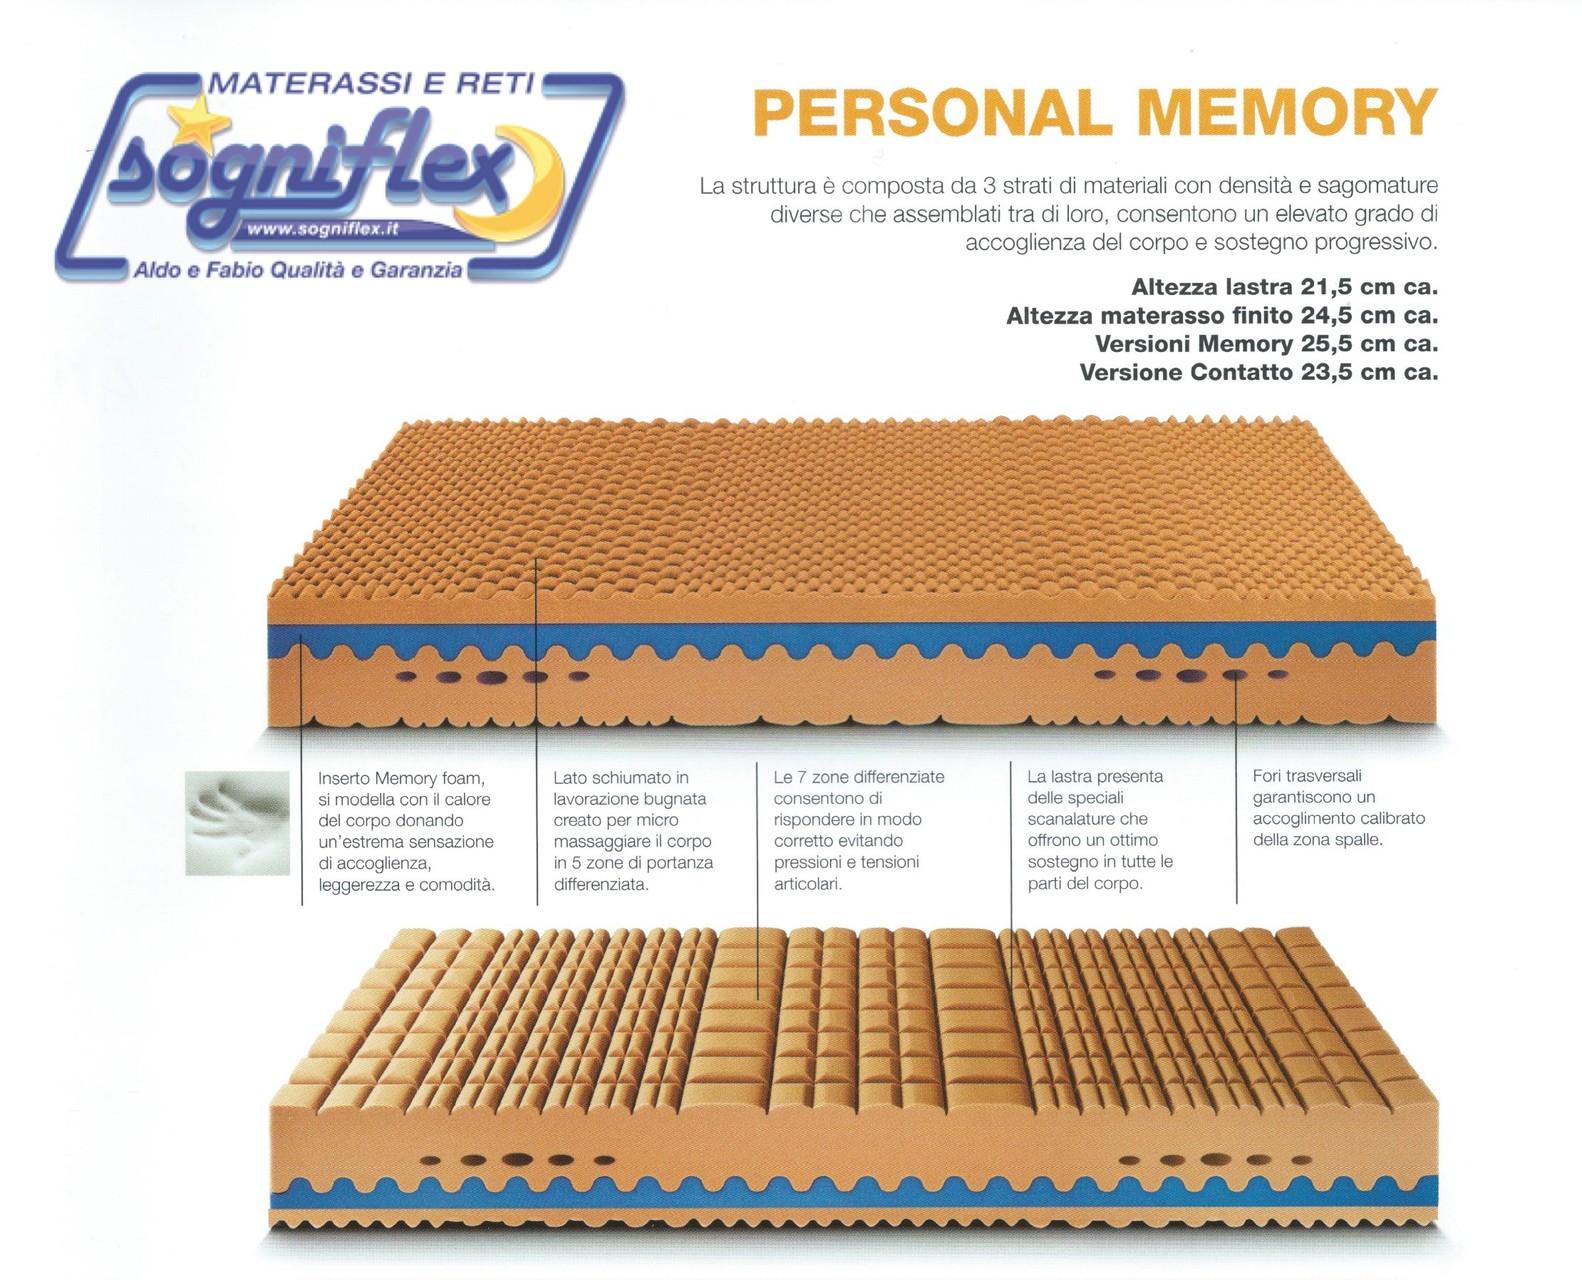 Materasso Personal Memory